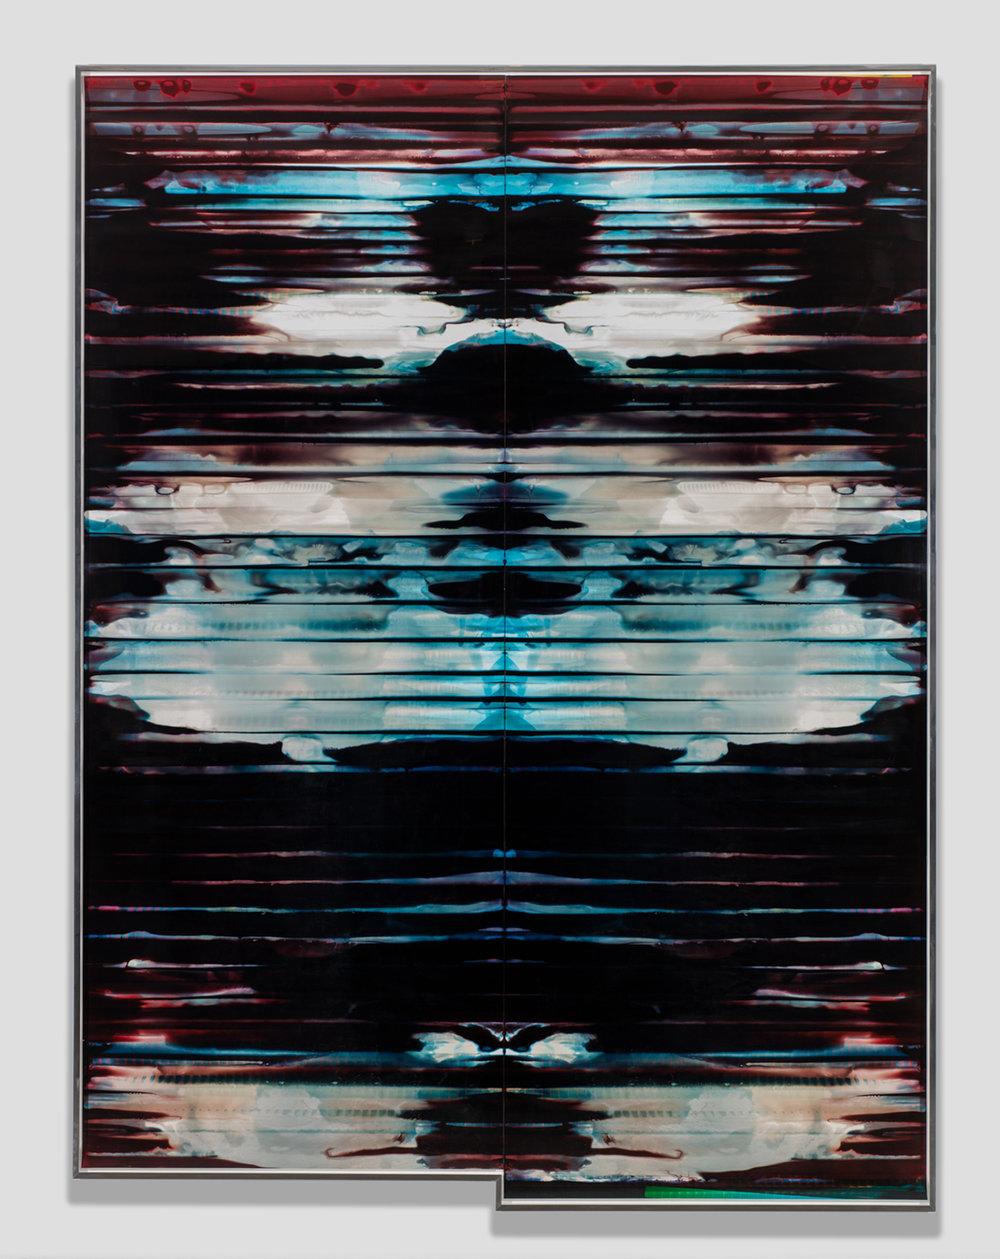 Inverted RA4 Contact Print / Processor Stall (YM: Los Angeles, California, November 10, 2017; Fujicolor Crystal Archive Super Type C, Em. No. 152-017; Kodak Ektacolor RA Bleach-Fix and Replenisher; Kreonite KM IV 5225 RA4 Color Processor, Ser. No. 00092174; 41917)   2018  Color photographic paper  135 1/4 x 101 3/4 inches   Equivalents, 2018